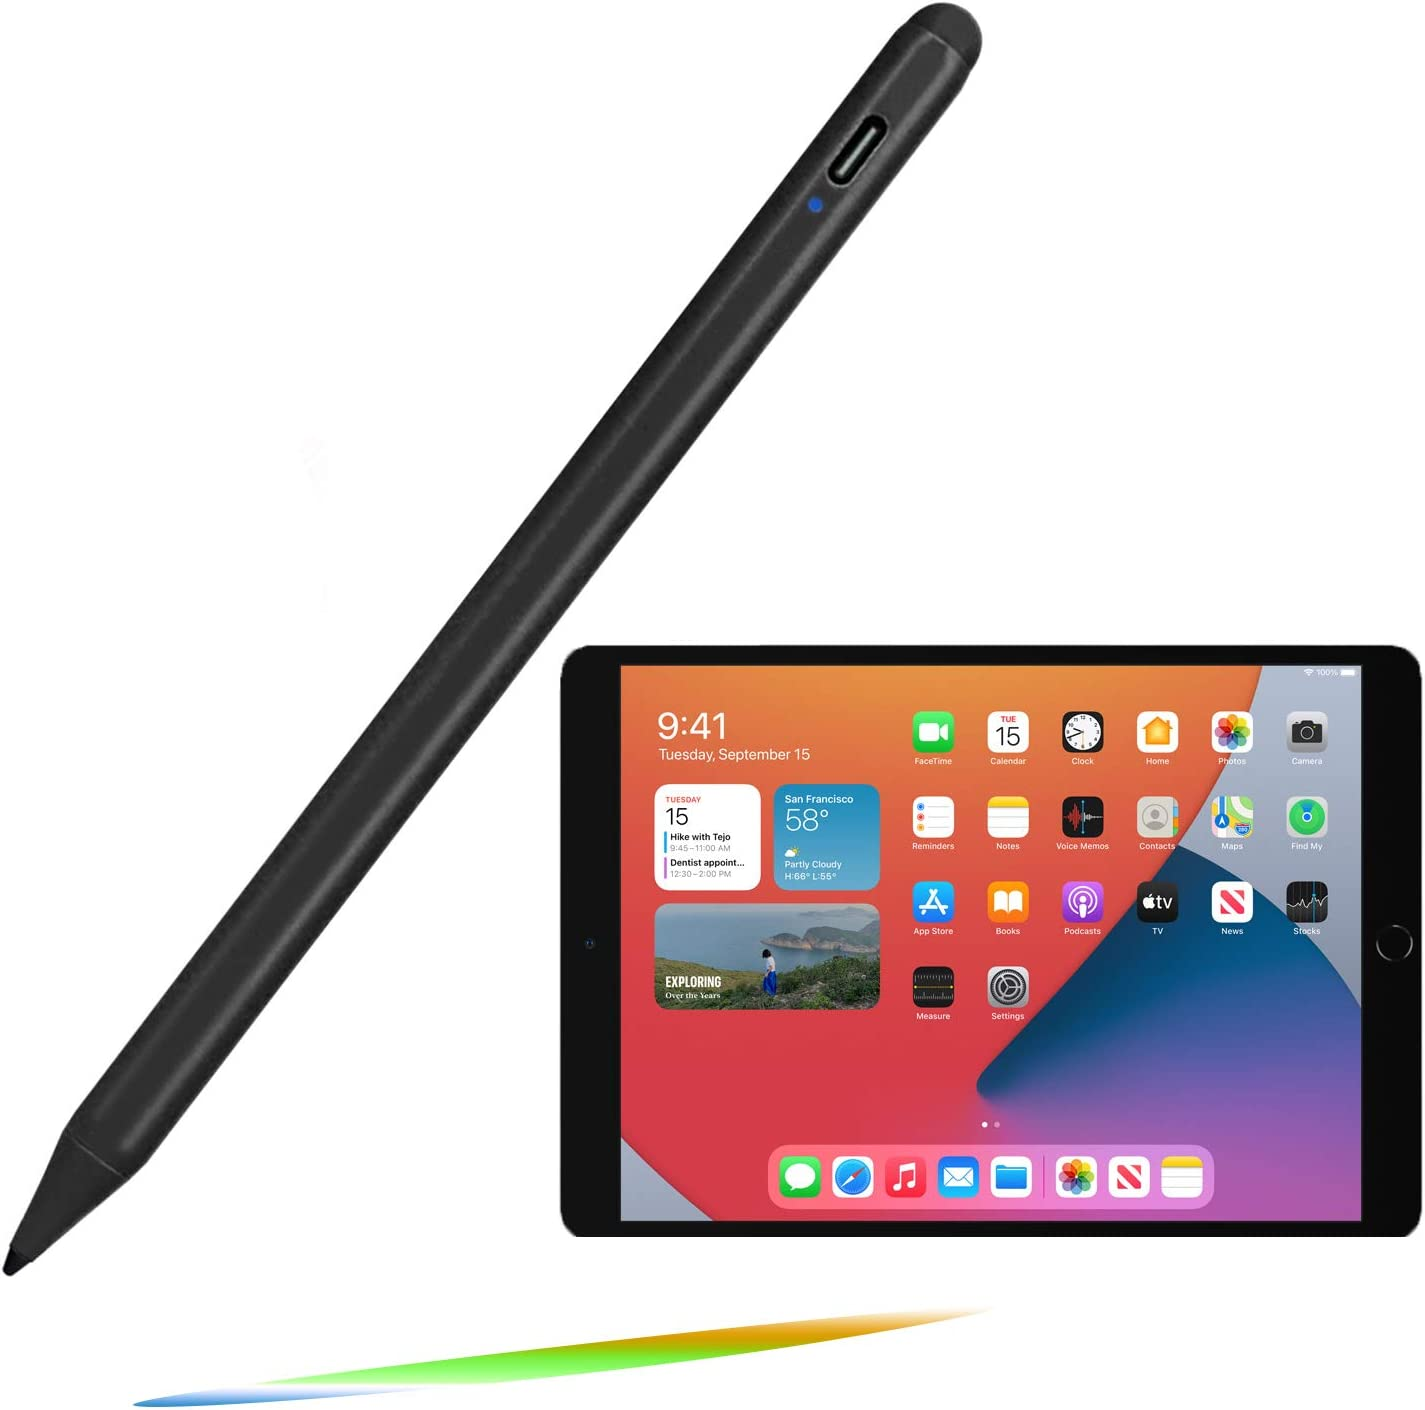 iPad Pro Pencil 4th Generation 12.9